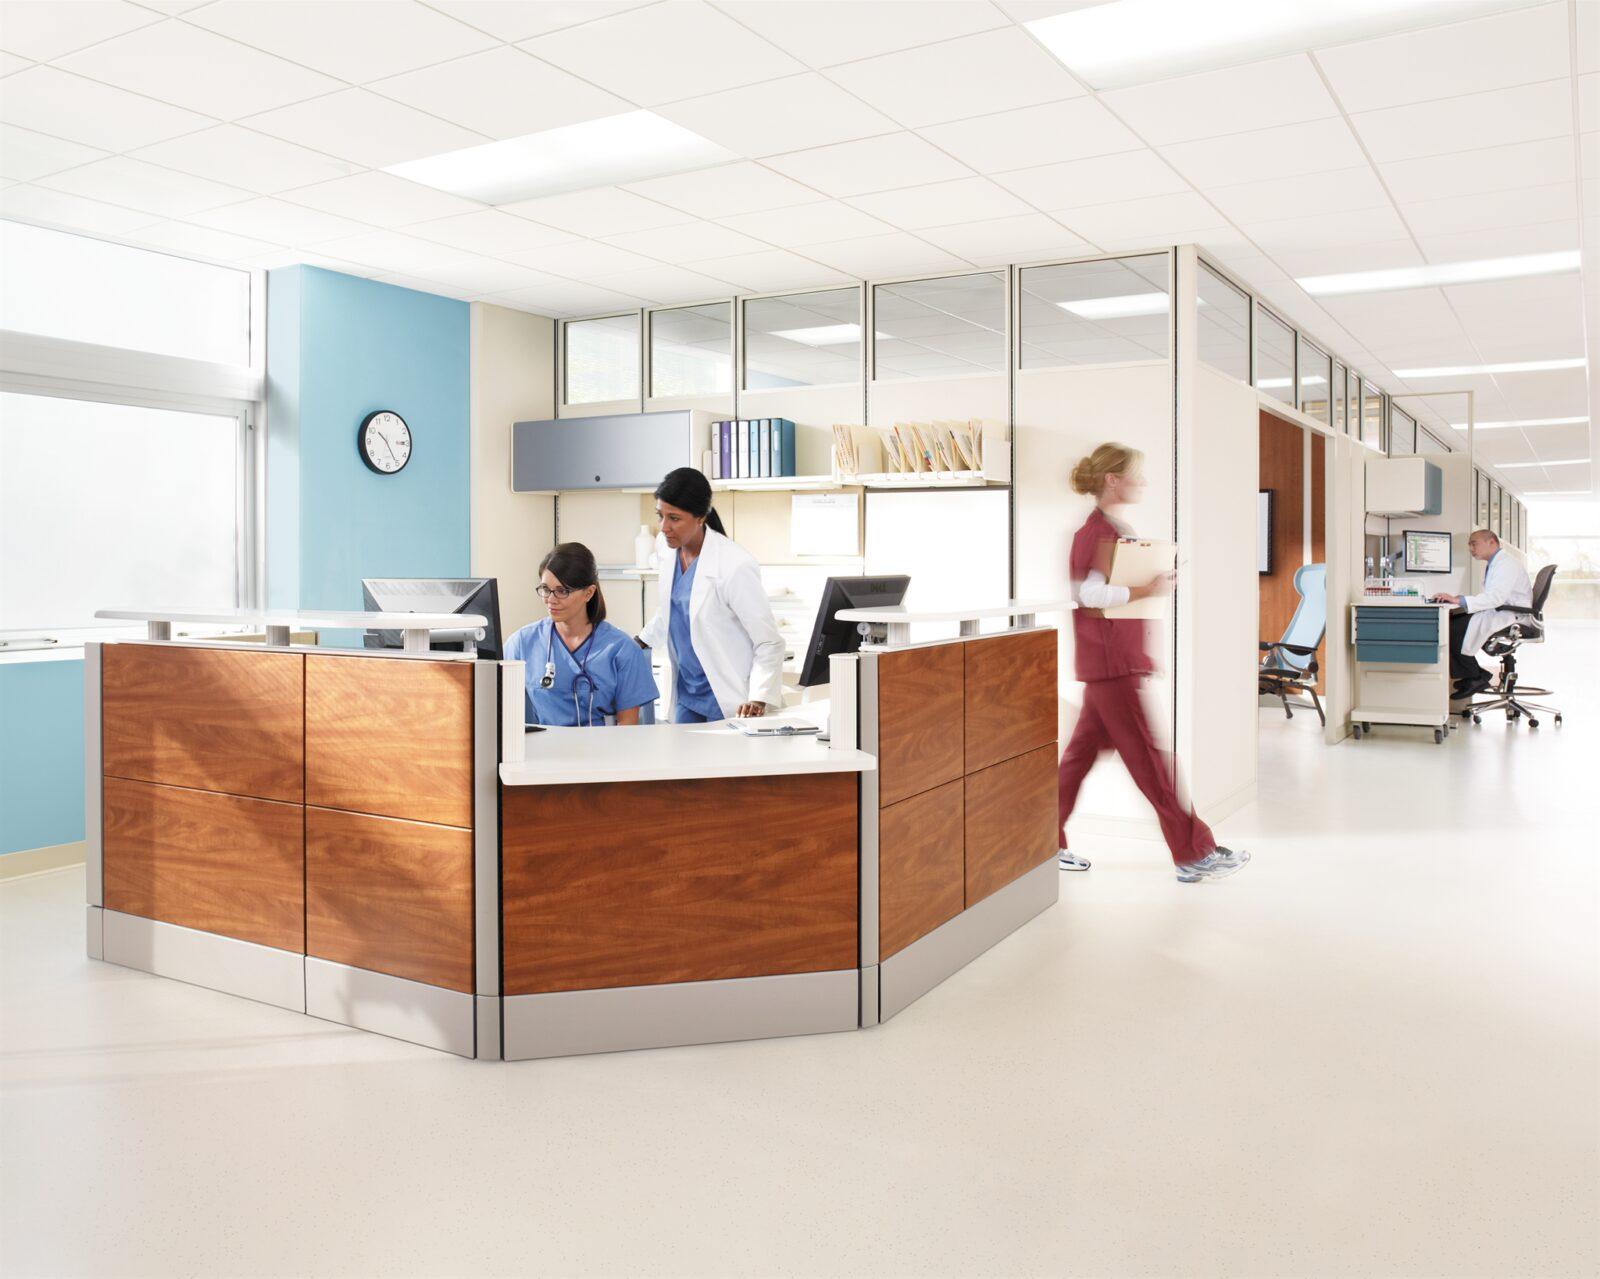 Markets Healthcare Nurses Station Gallery